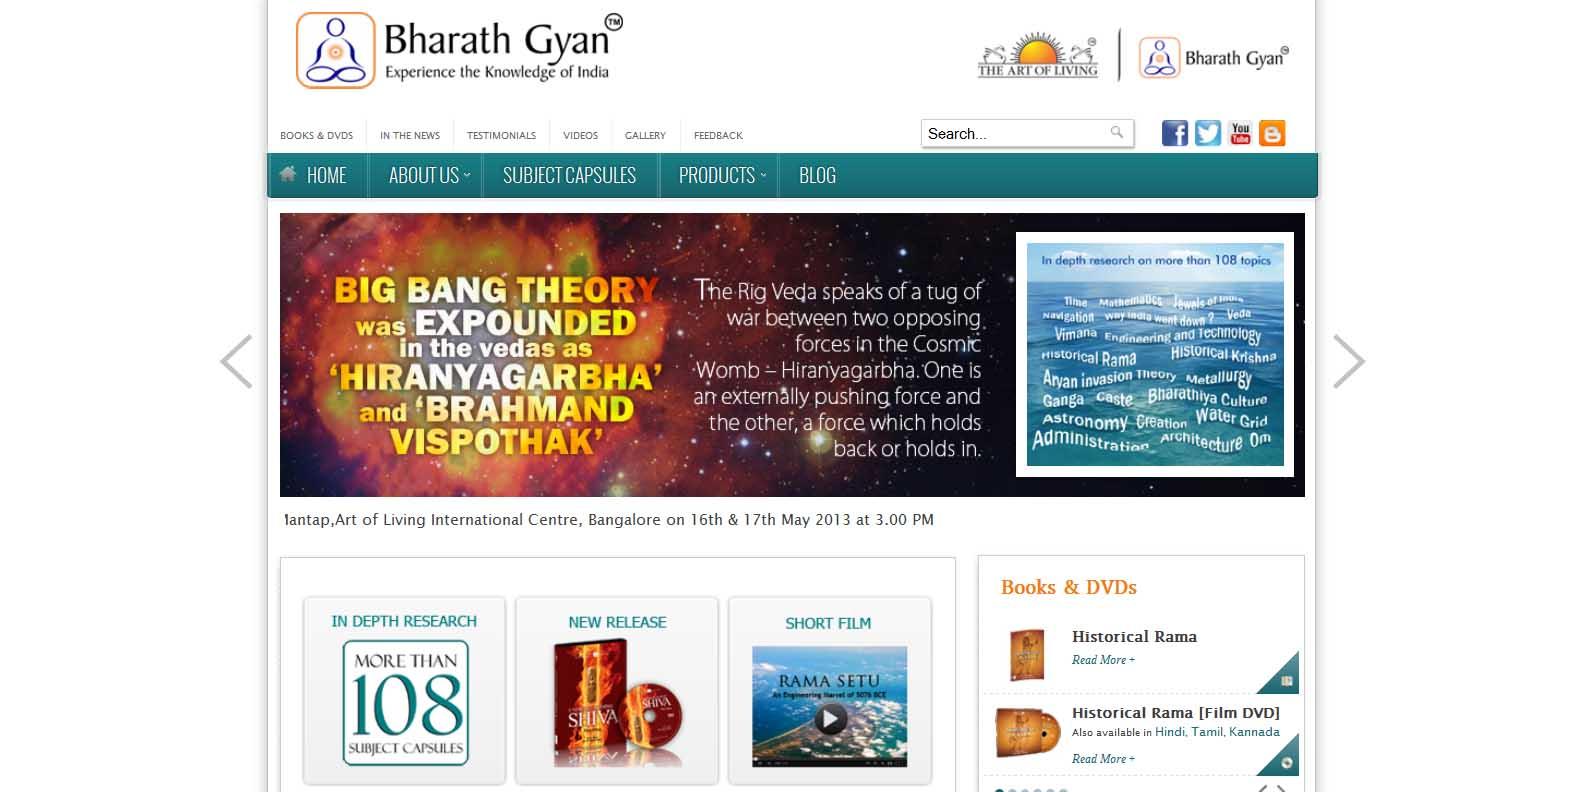 Bharath Gyan Site